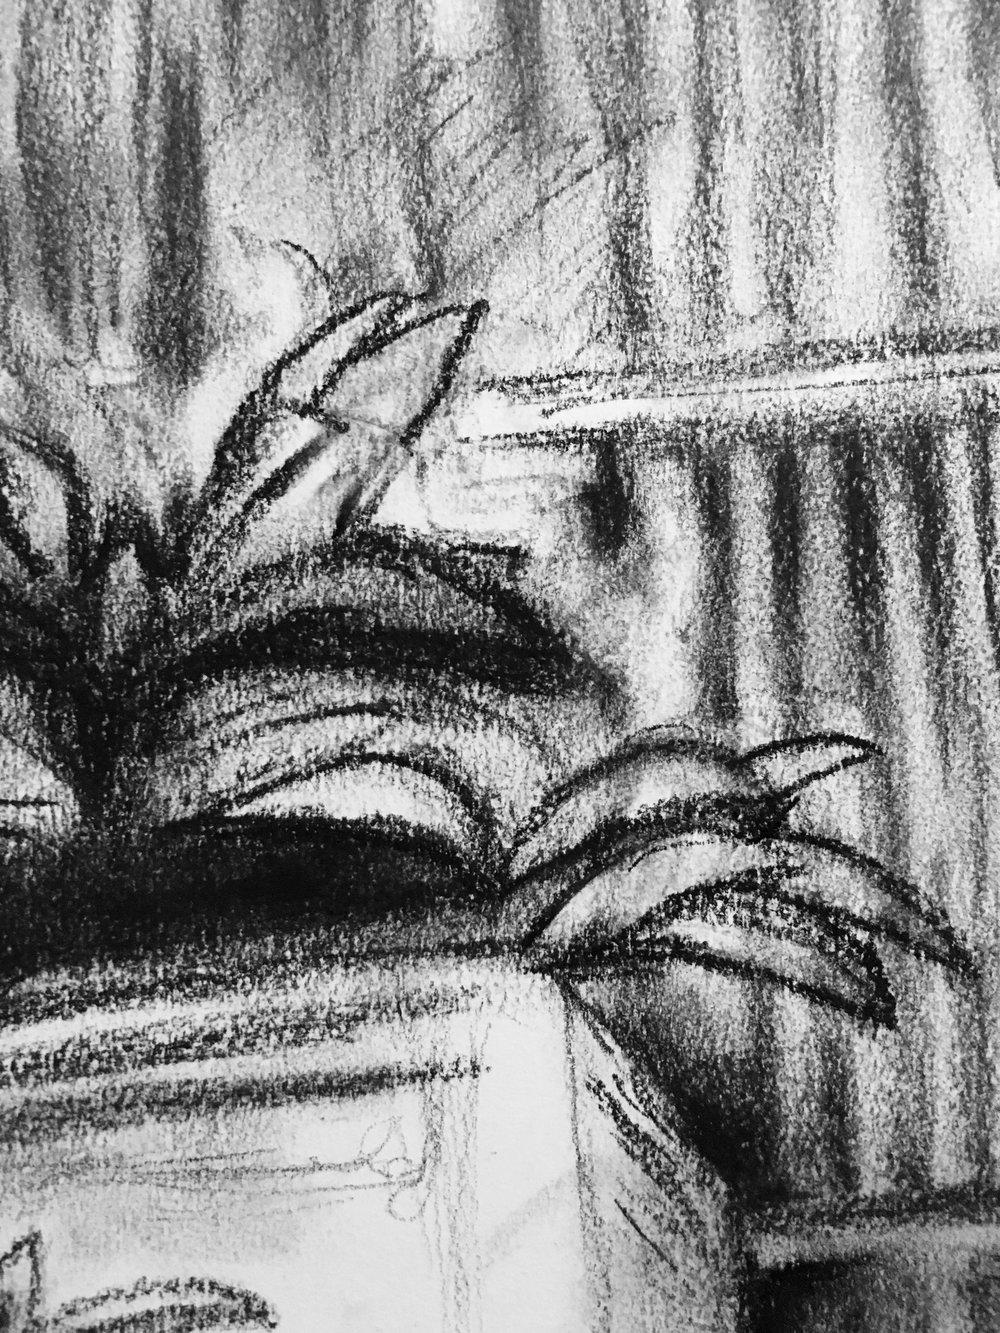 Closeup of erased/re-drawn greenery